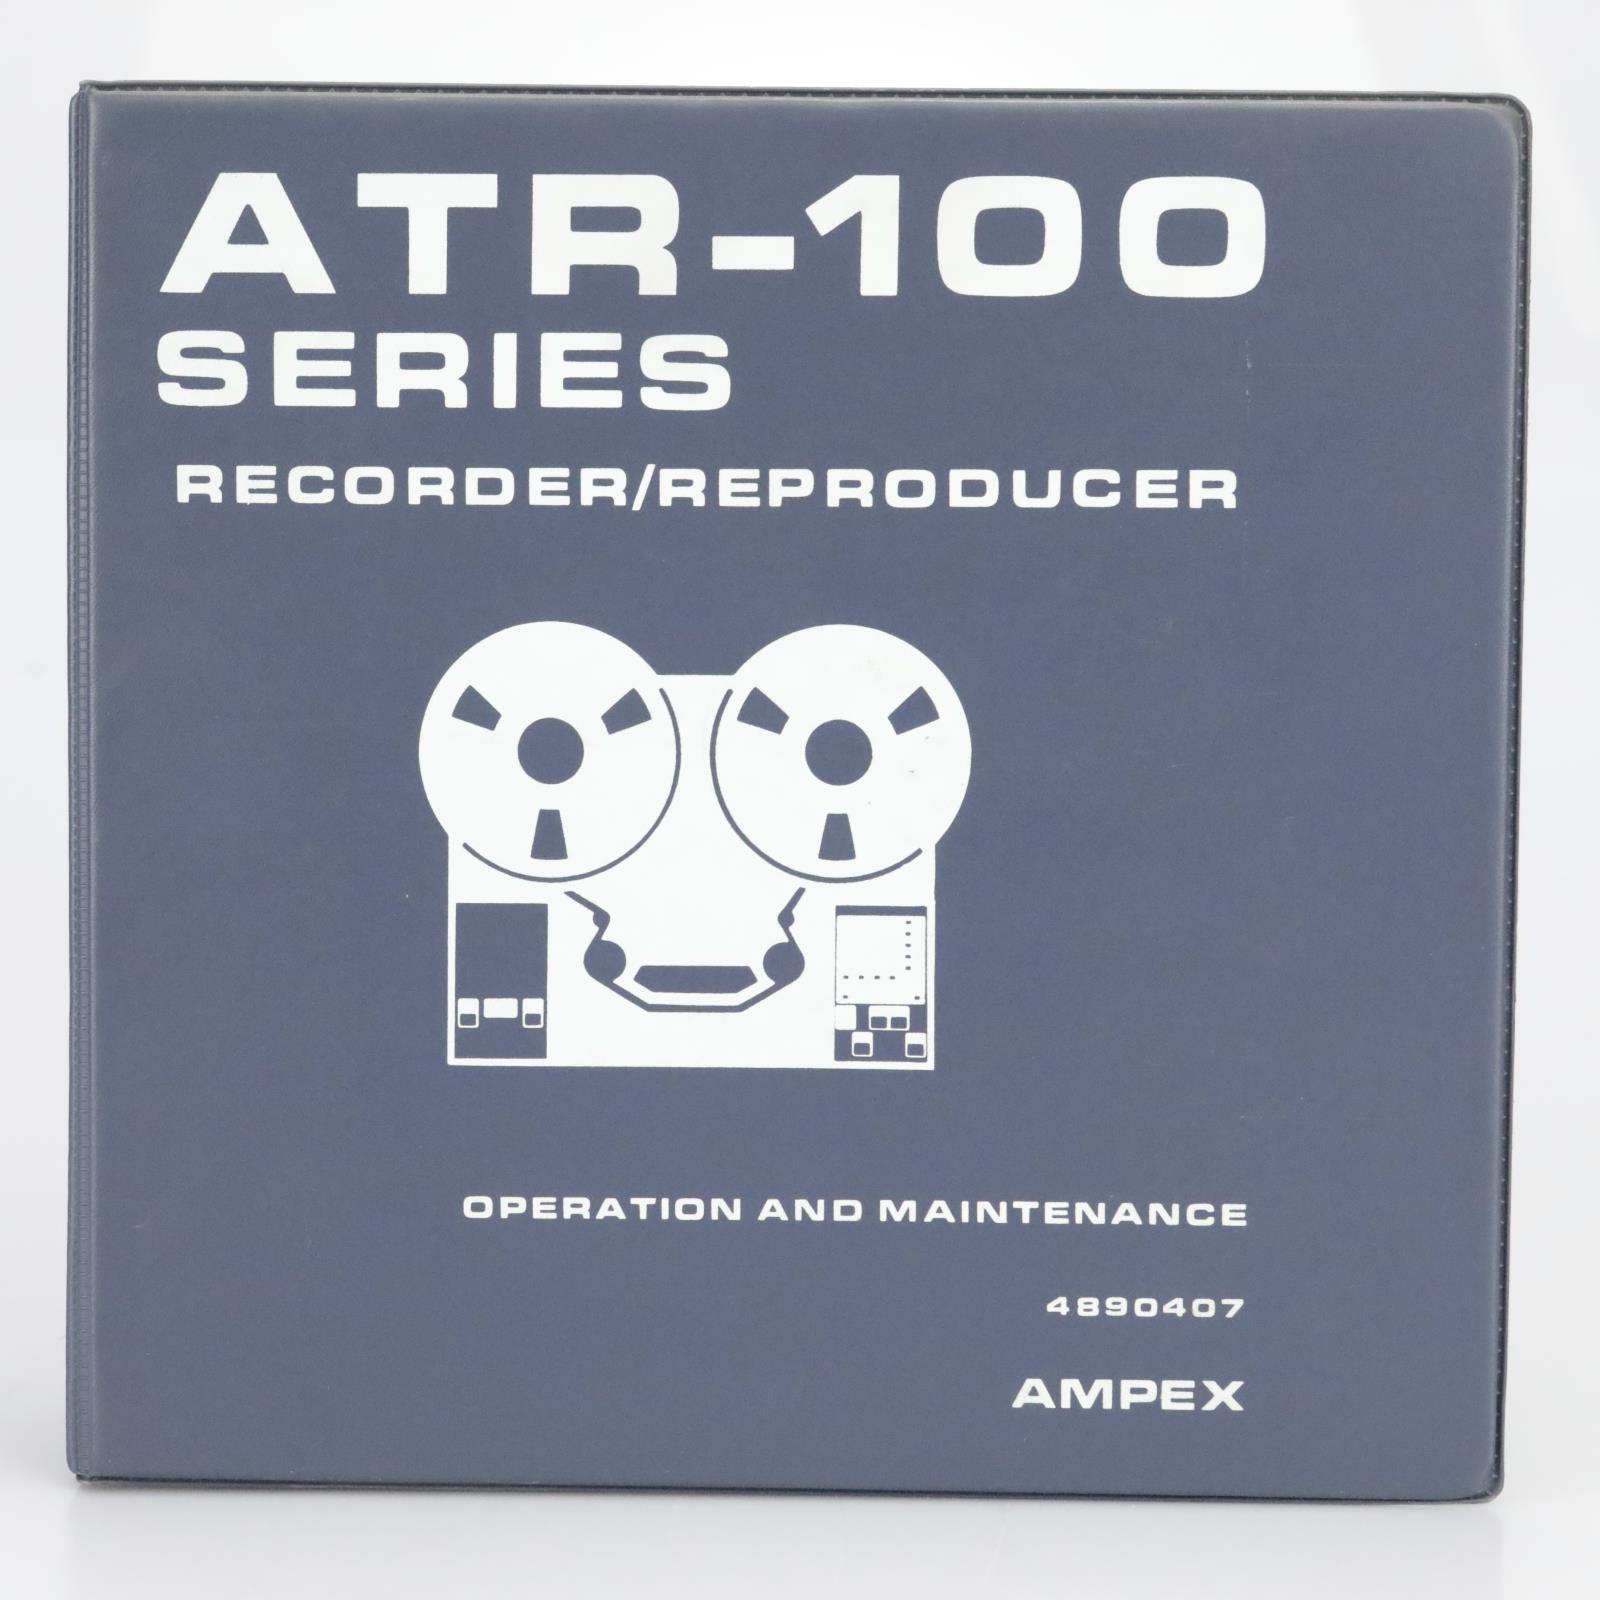 Ampex ATR-100 Series Recorder Operation & Maintenance Manual 102 104 #39685